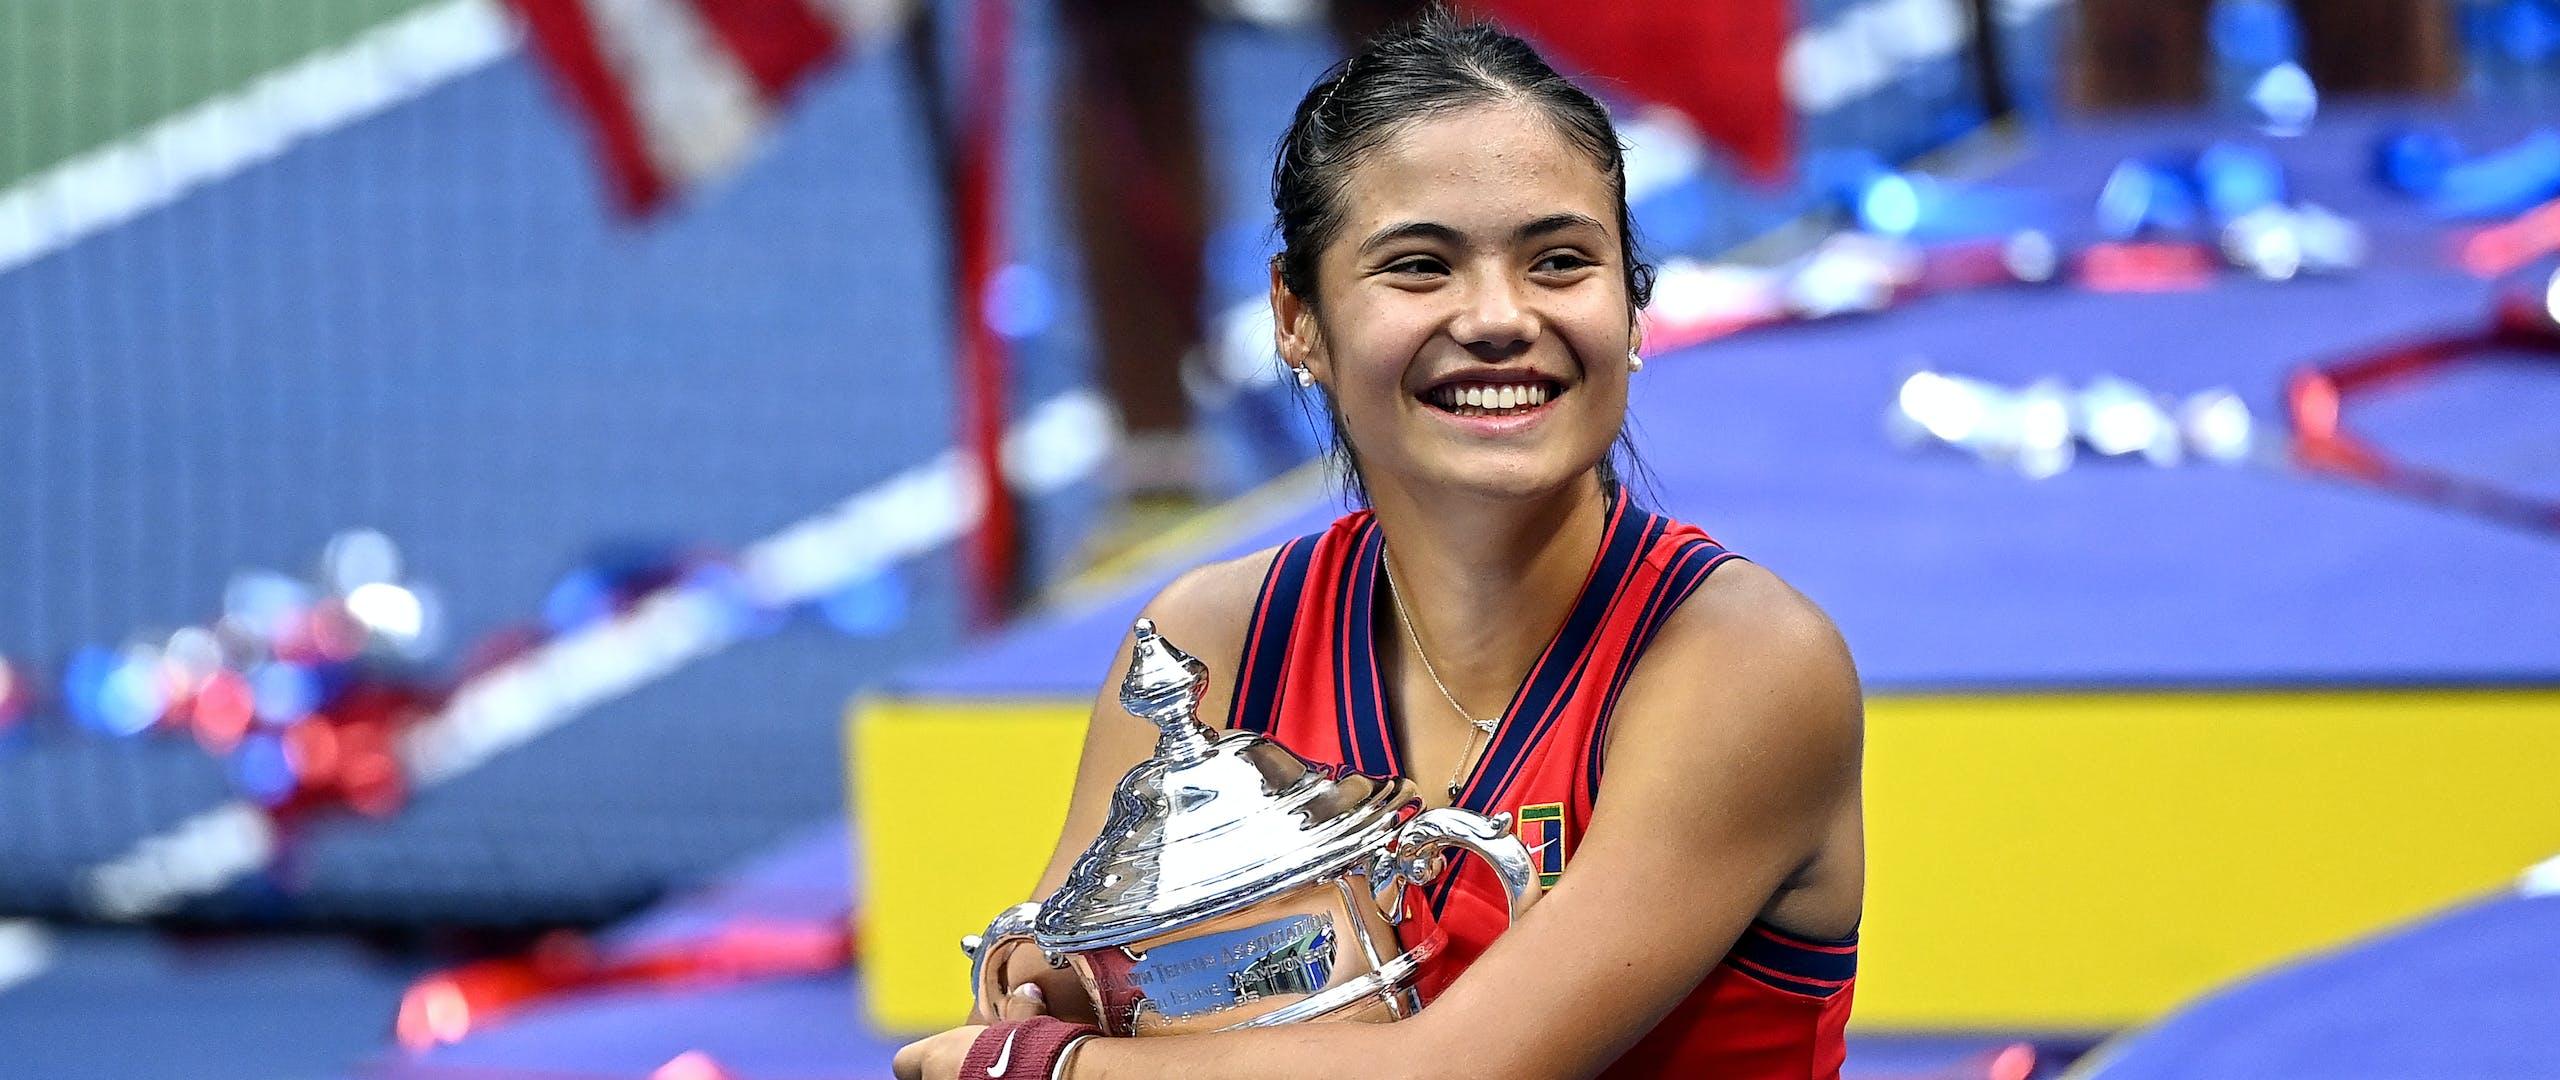 Emma Raducanu holding the trophy / US Open 2021